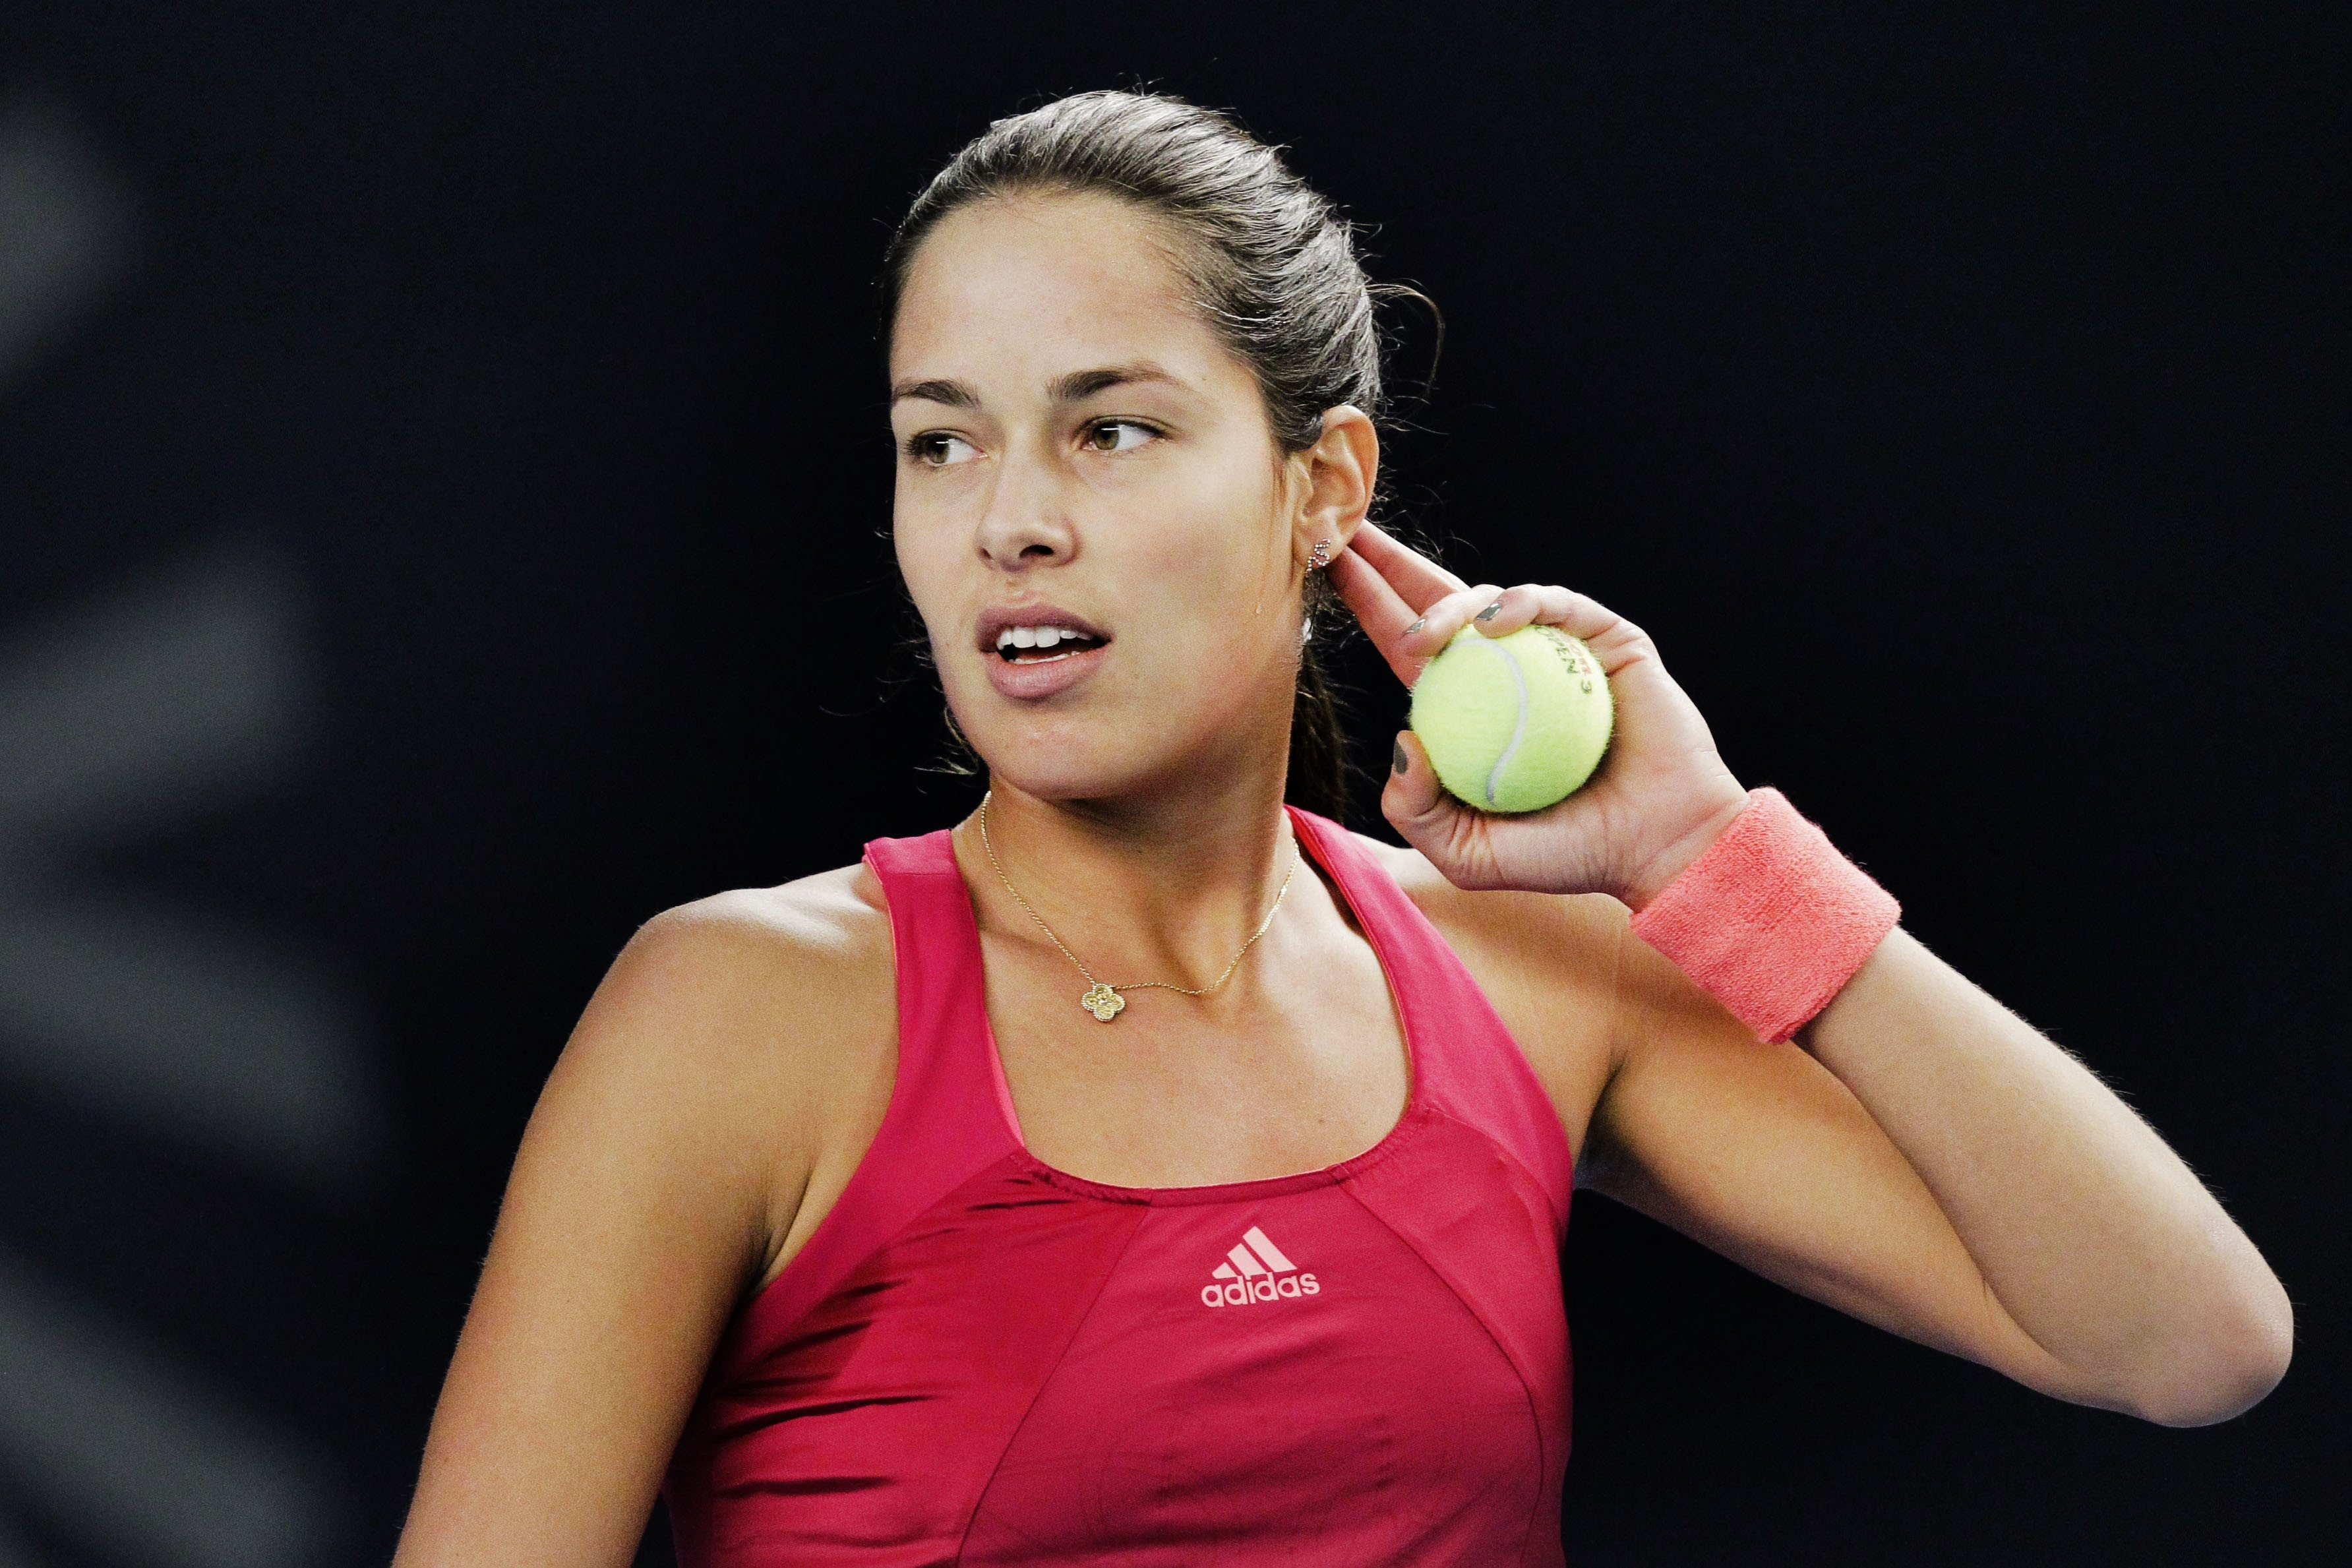 Ana ivanovic tennis hd wallpapers desktop and mobile - Ana wallpaper ...